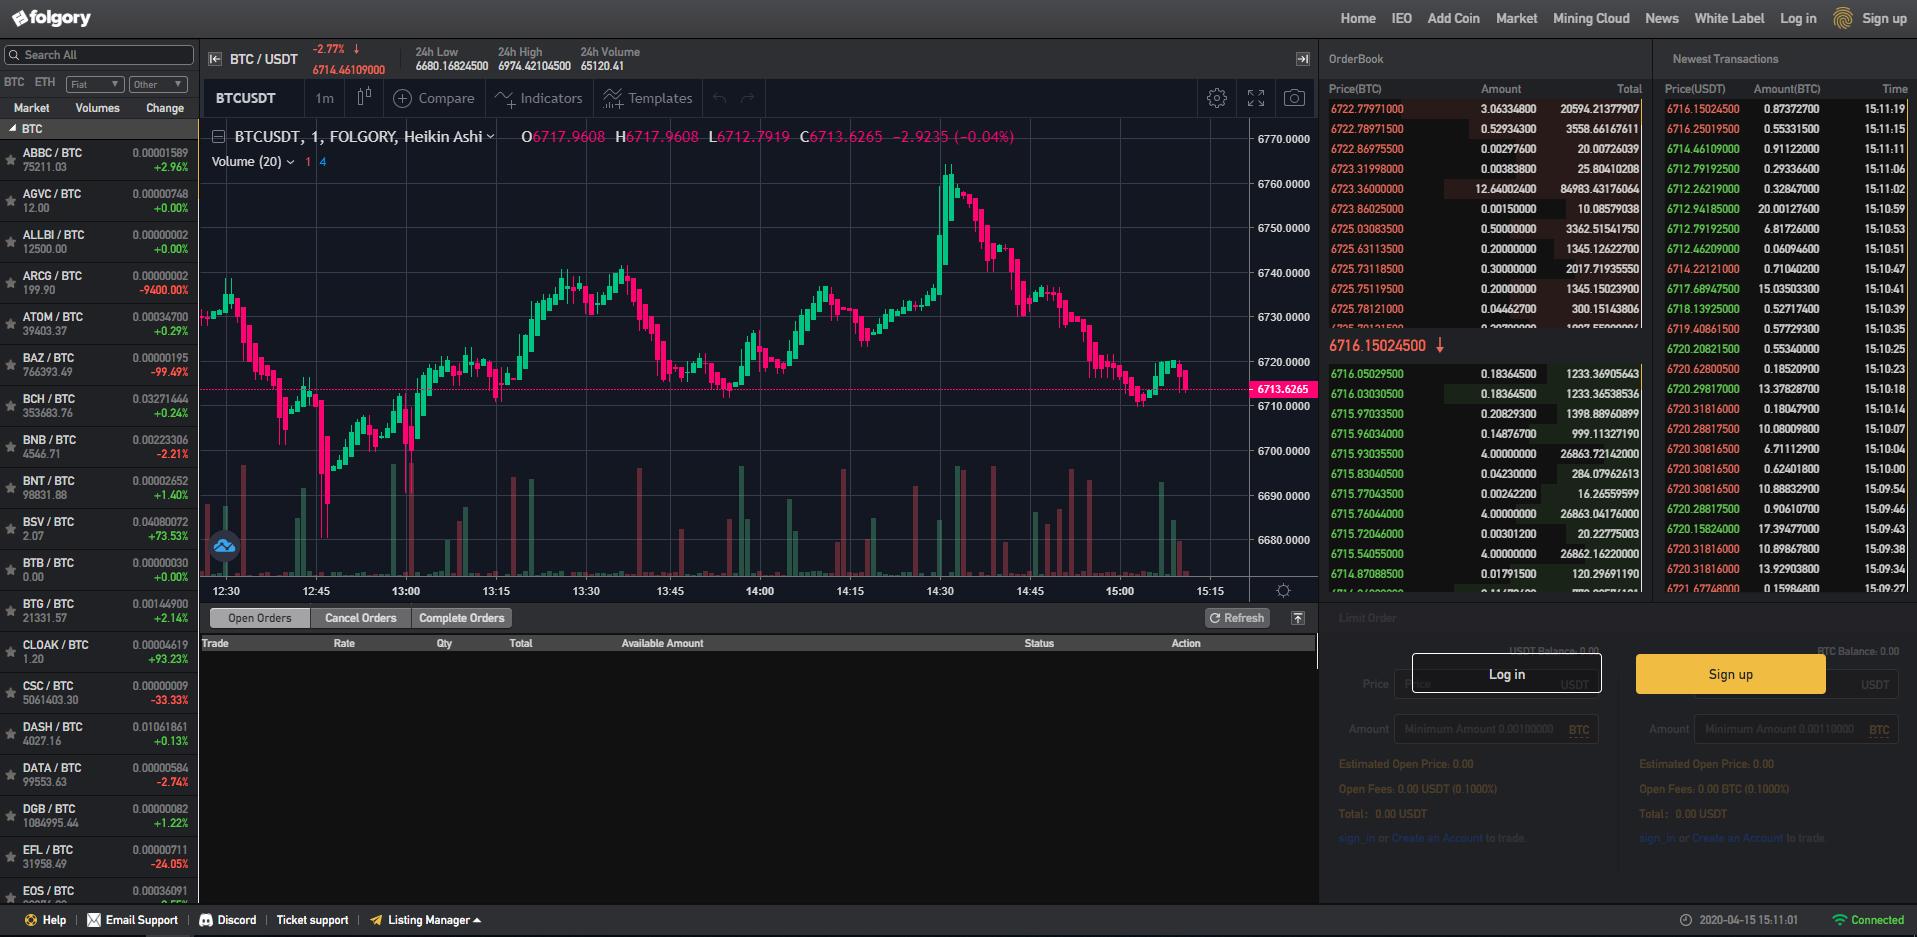 Folgory Trading View